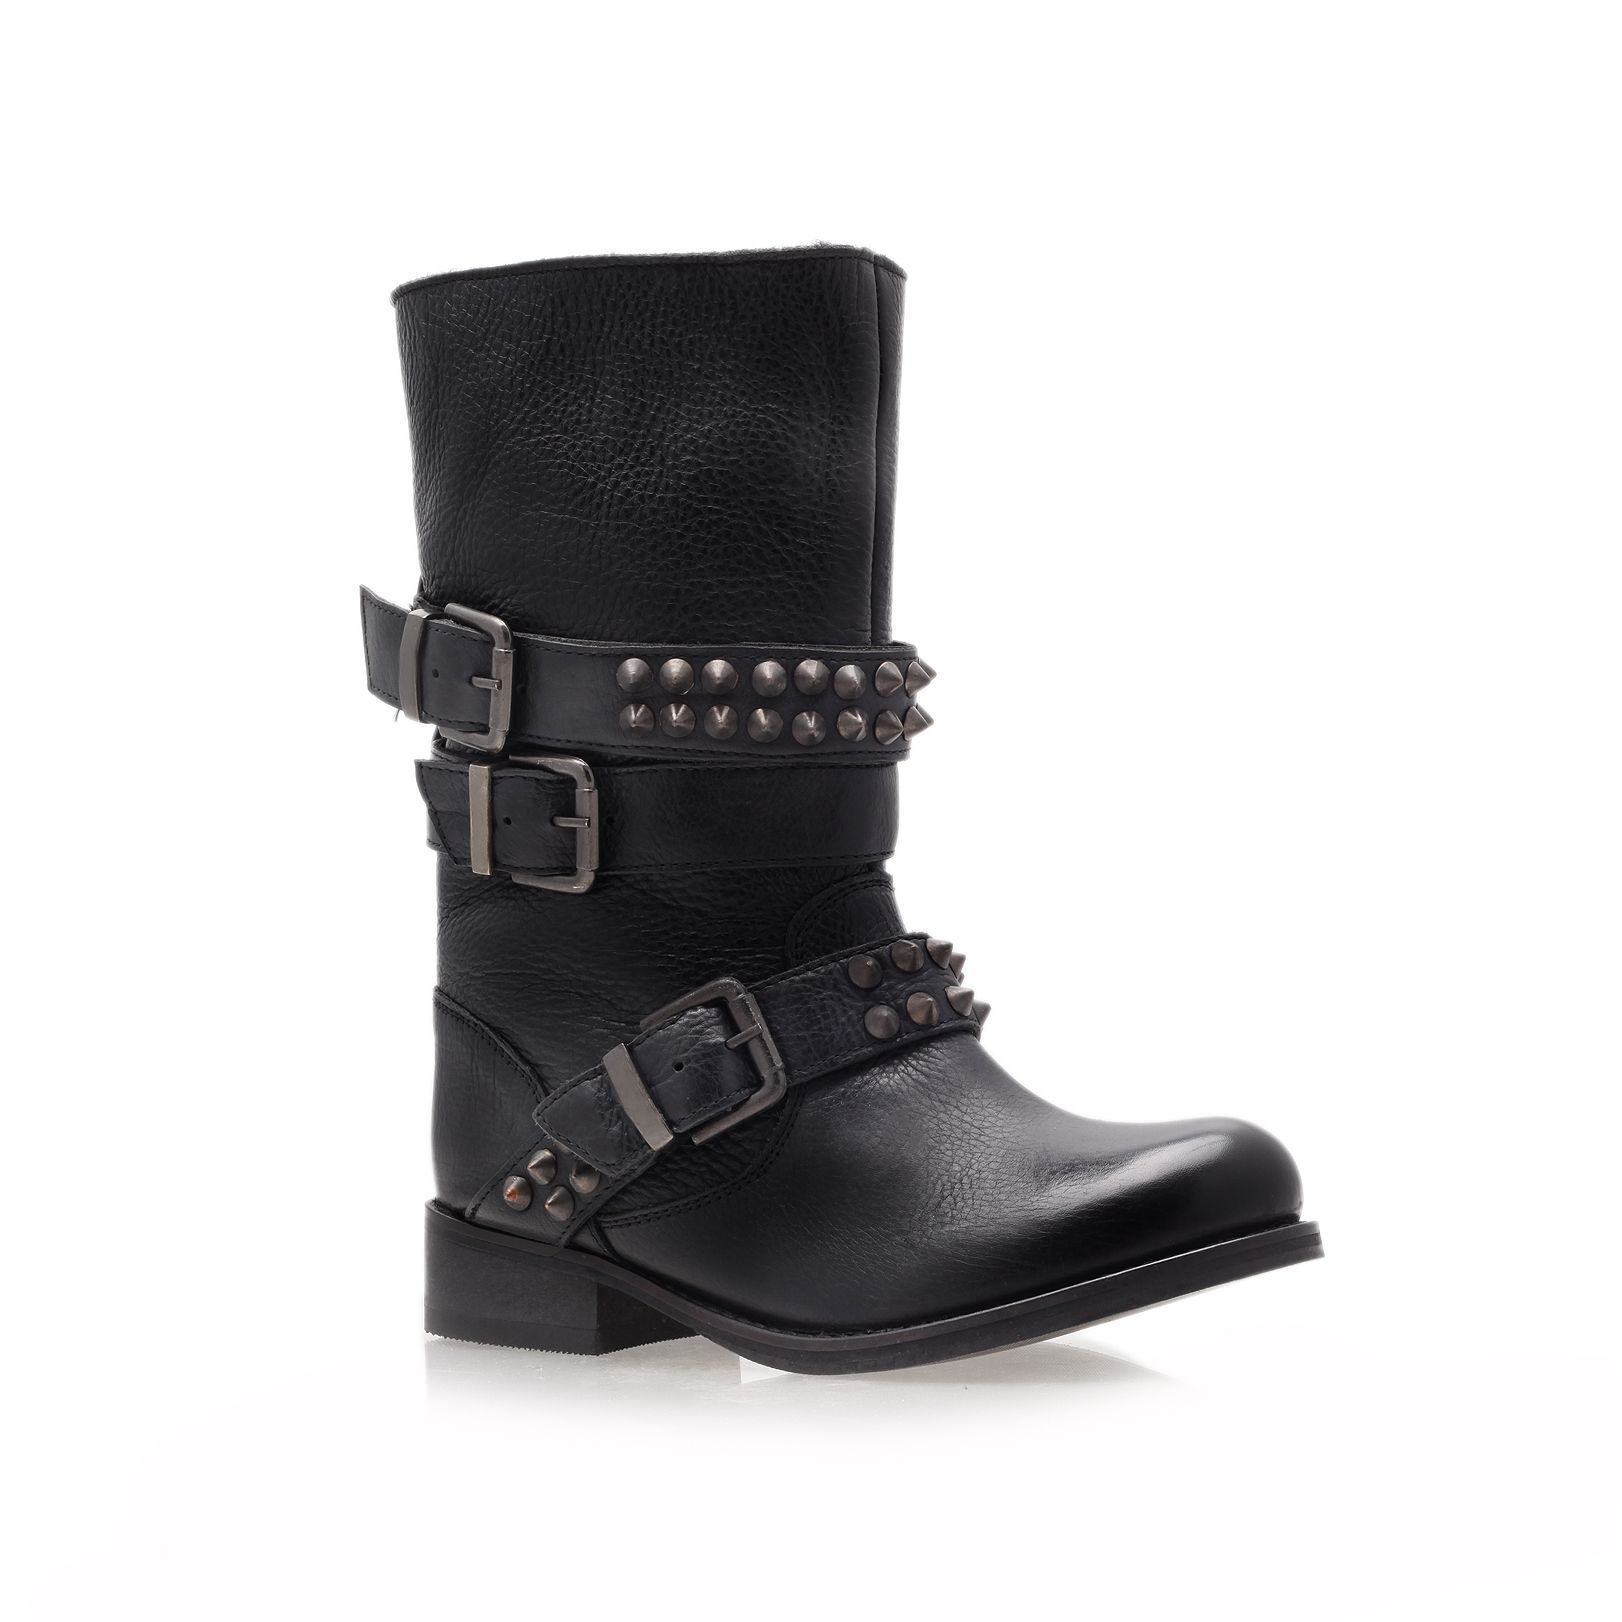 carvela kurt geiger studded leather flat boots in